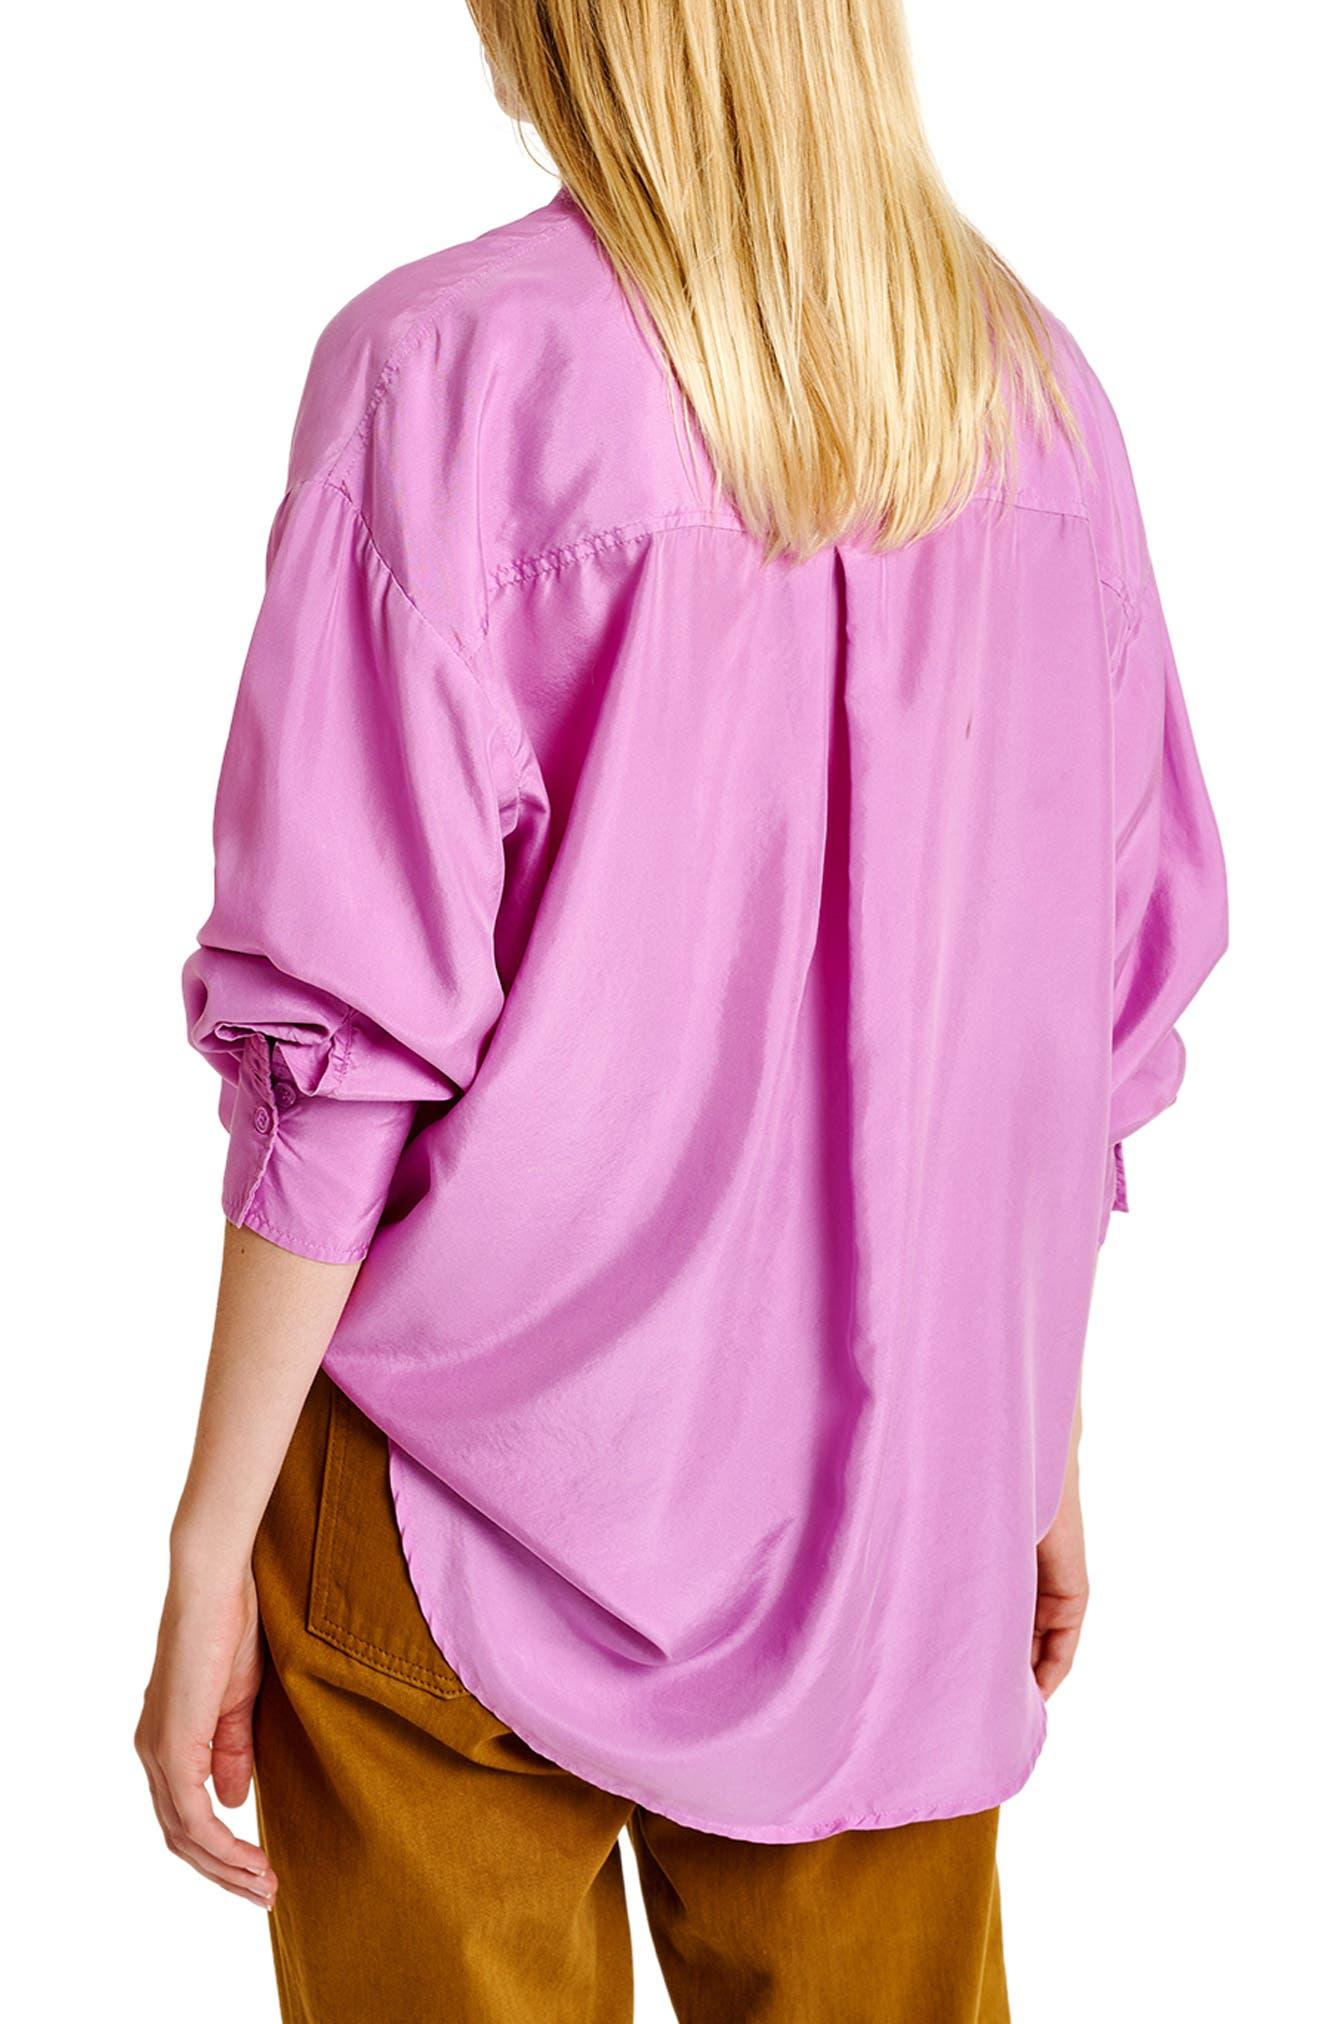 Washed Silk Button-Up Shirt